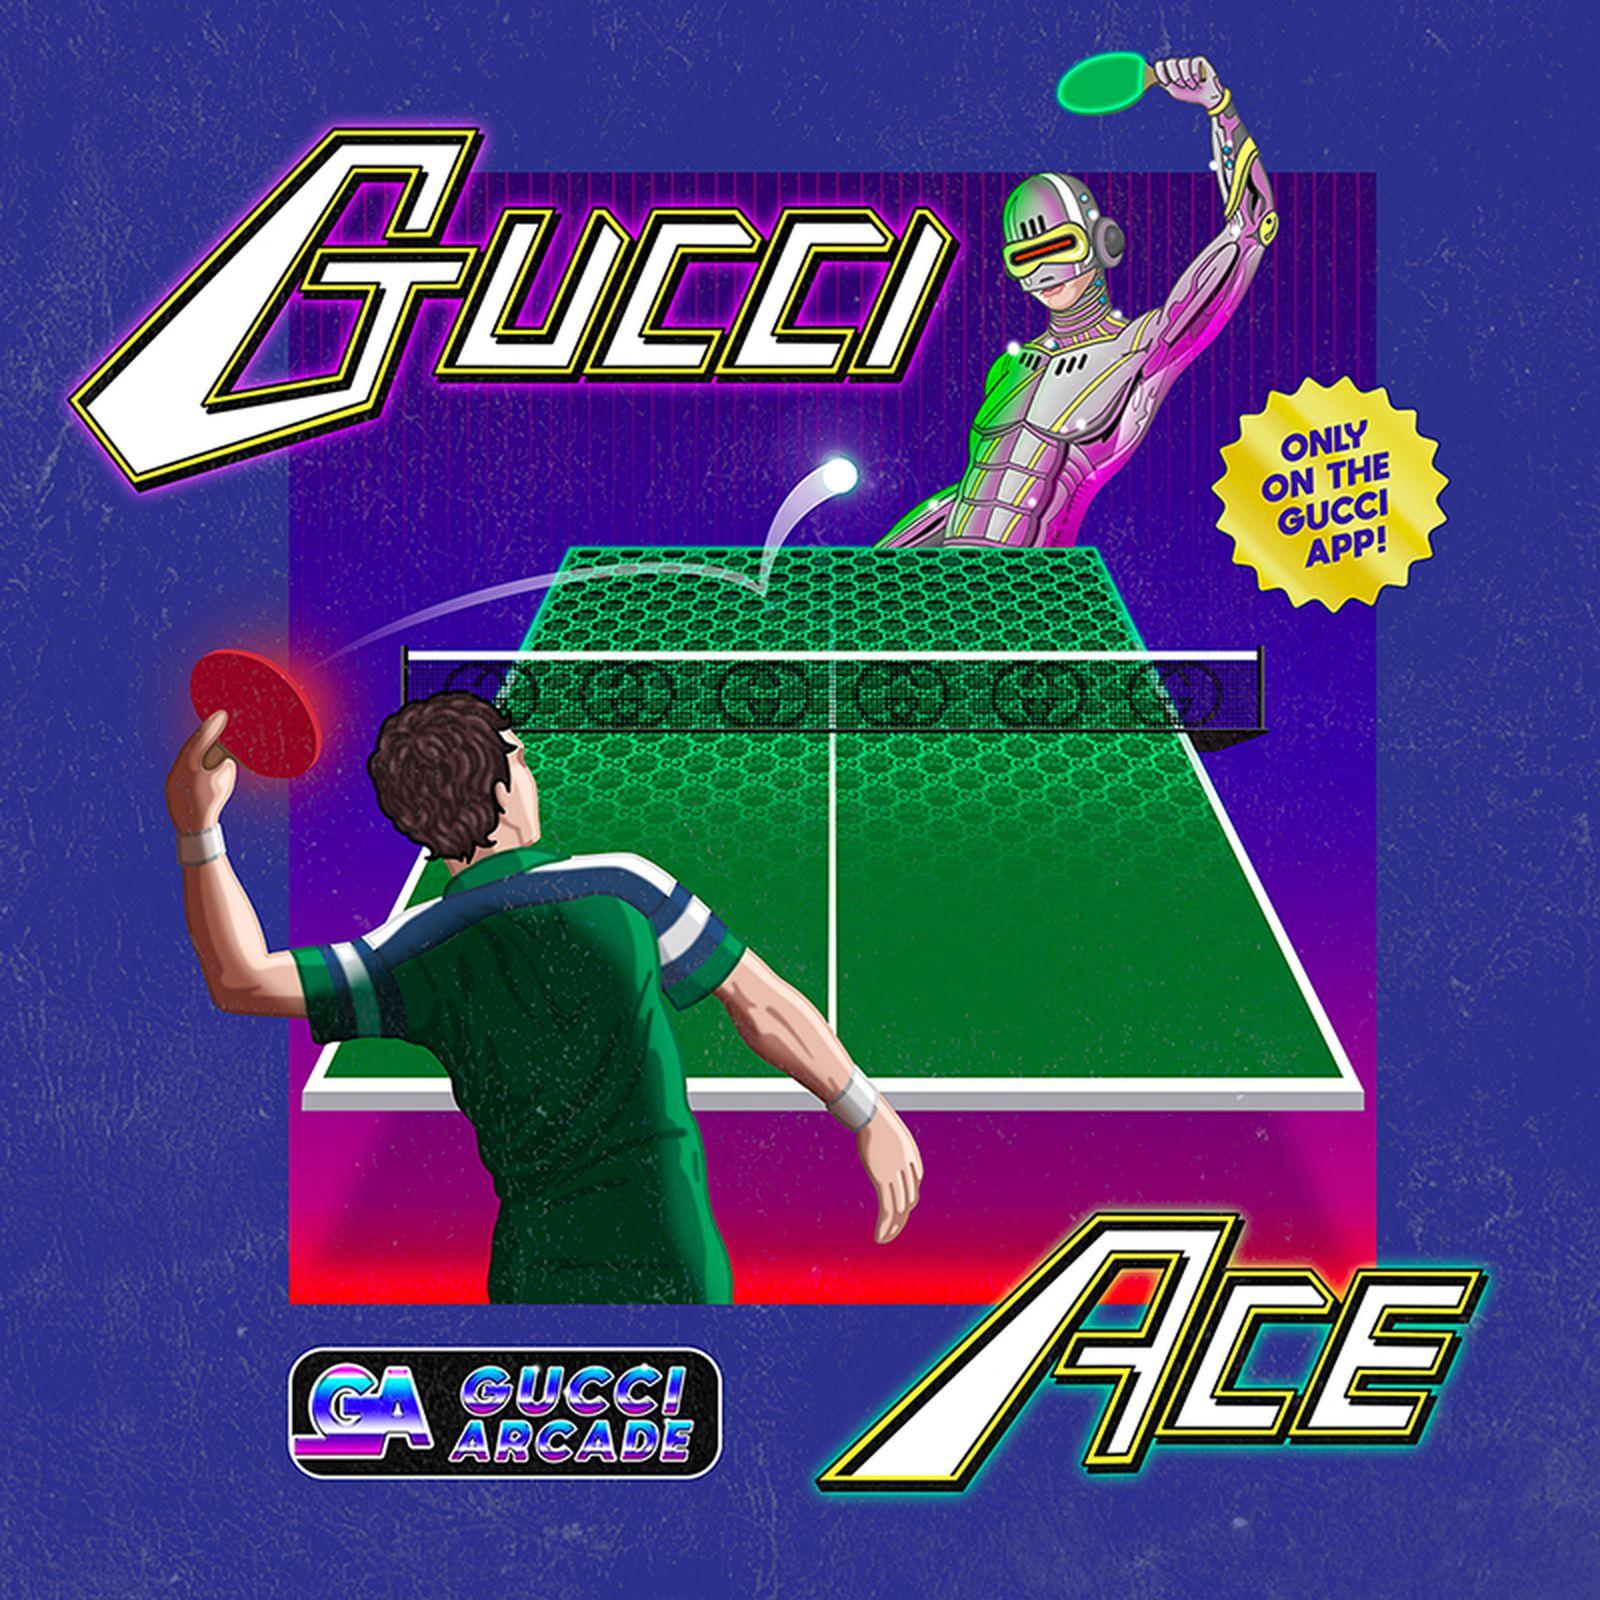 gucci arcade games